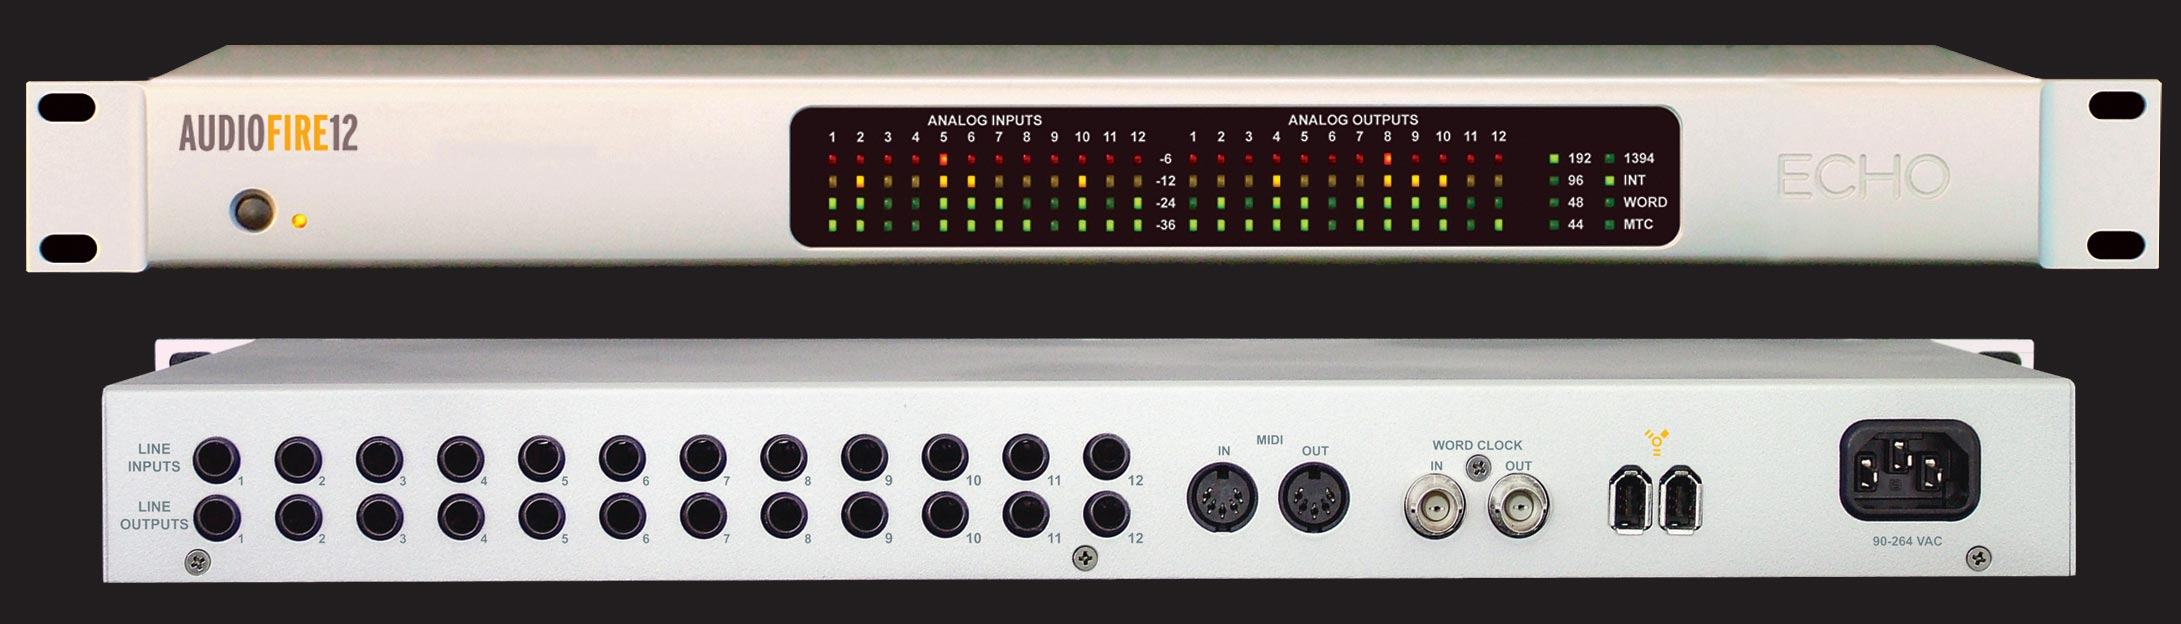 echo-audiofire-12-293678.jpg